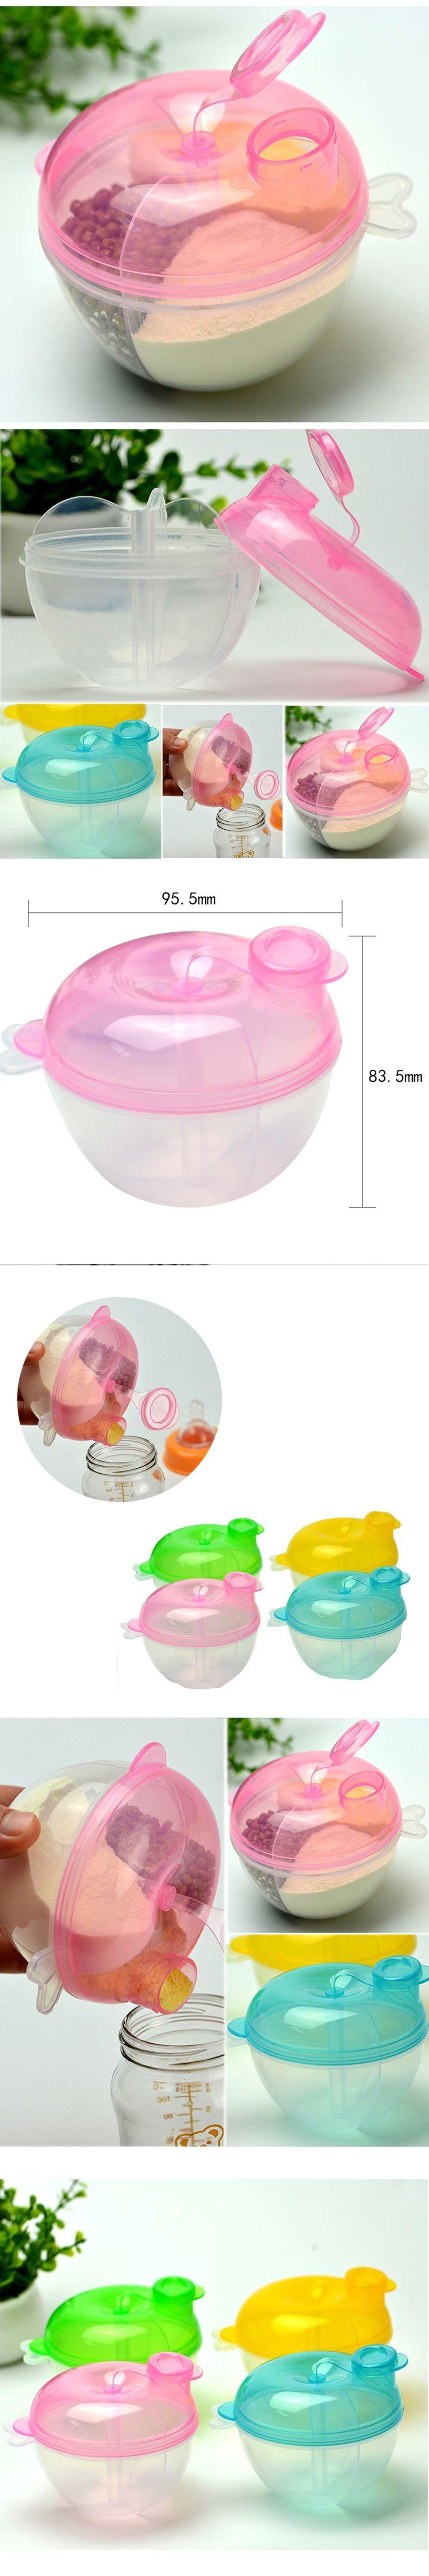 c0fe1c8a02fe 1pcs Portable Baby Milk Powder Formula Dispenser Infant Feeding Milk ...